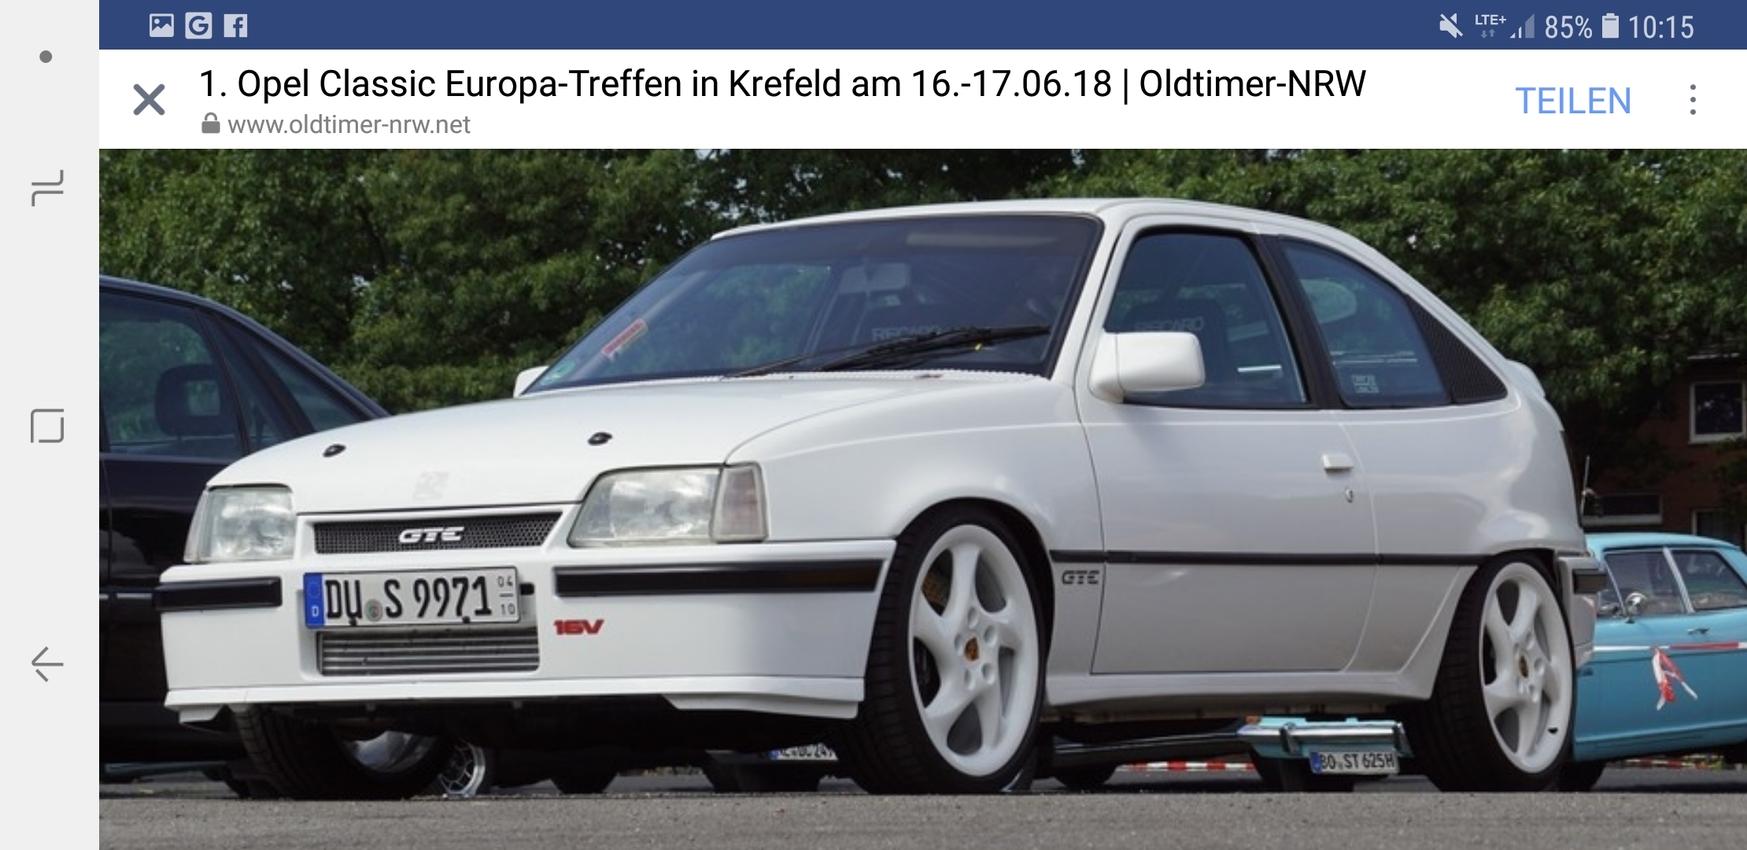 1. Classic Europa Treffen in Krefeld Oldtimer  NRW